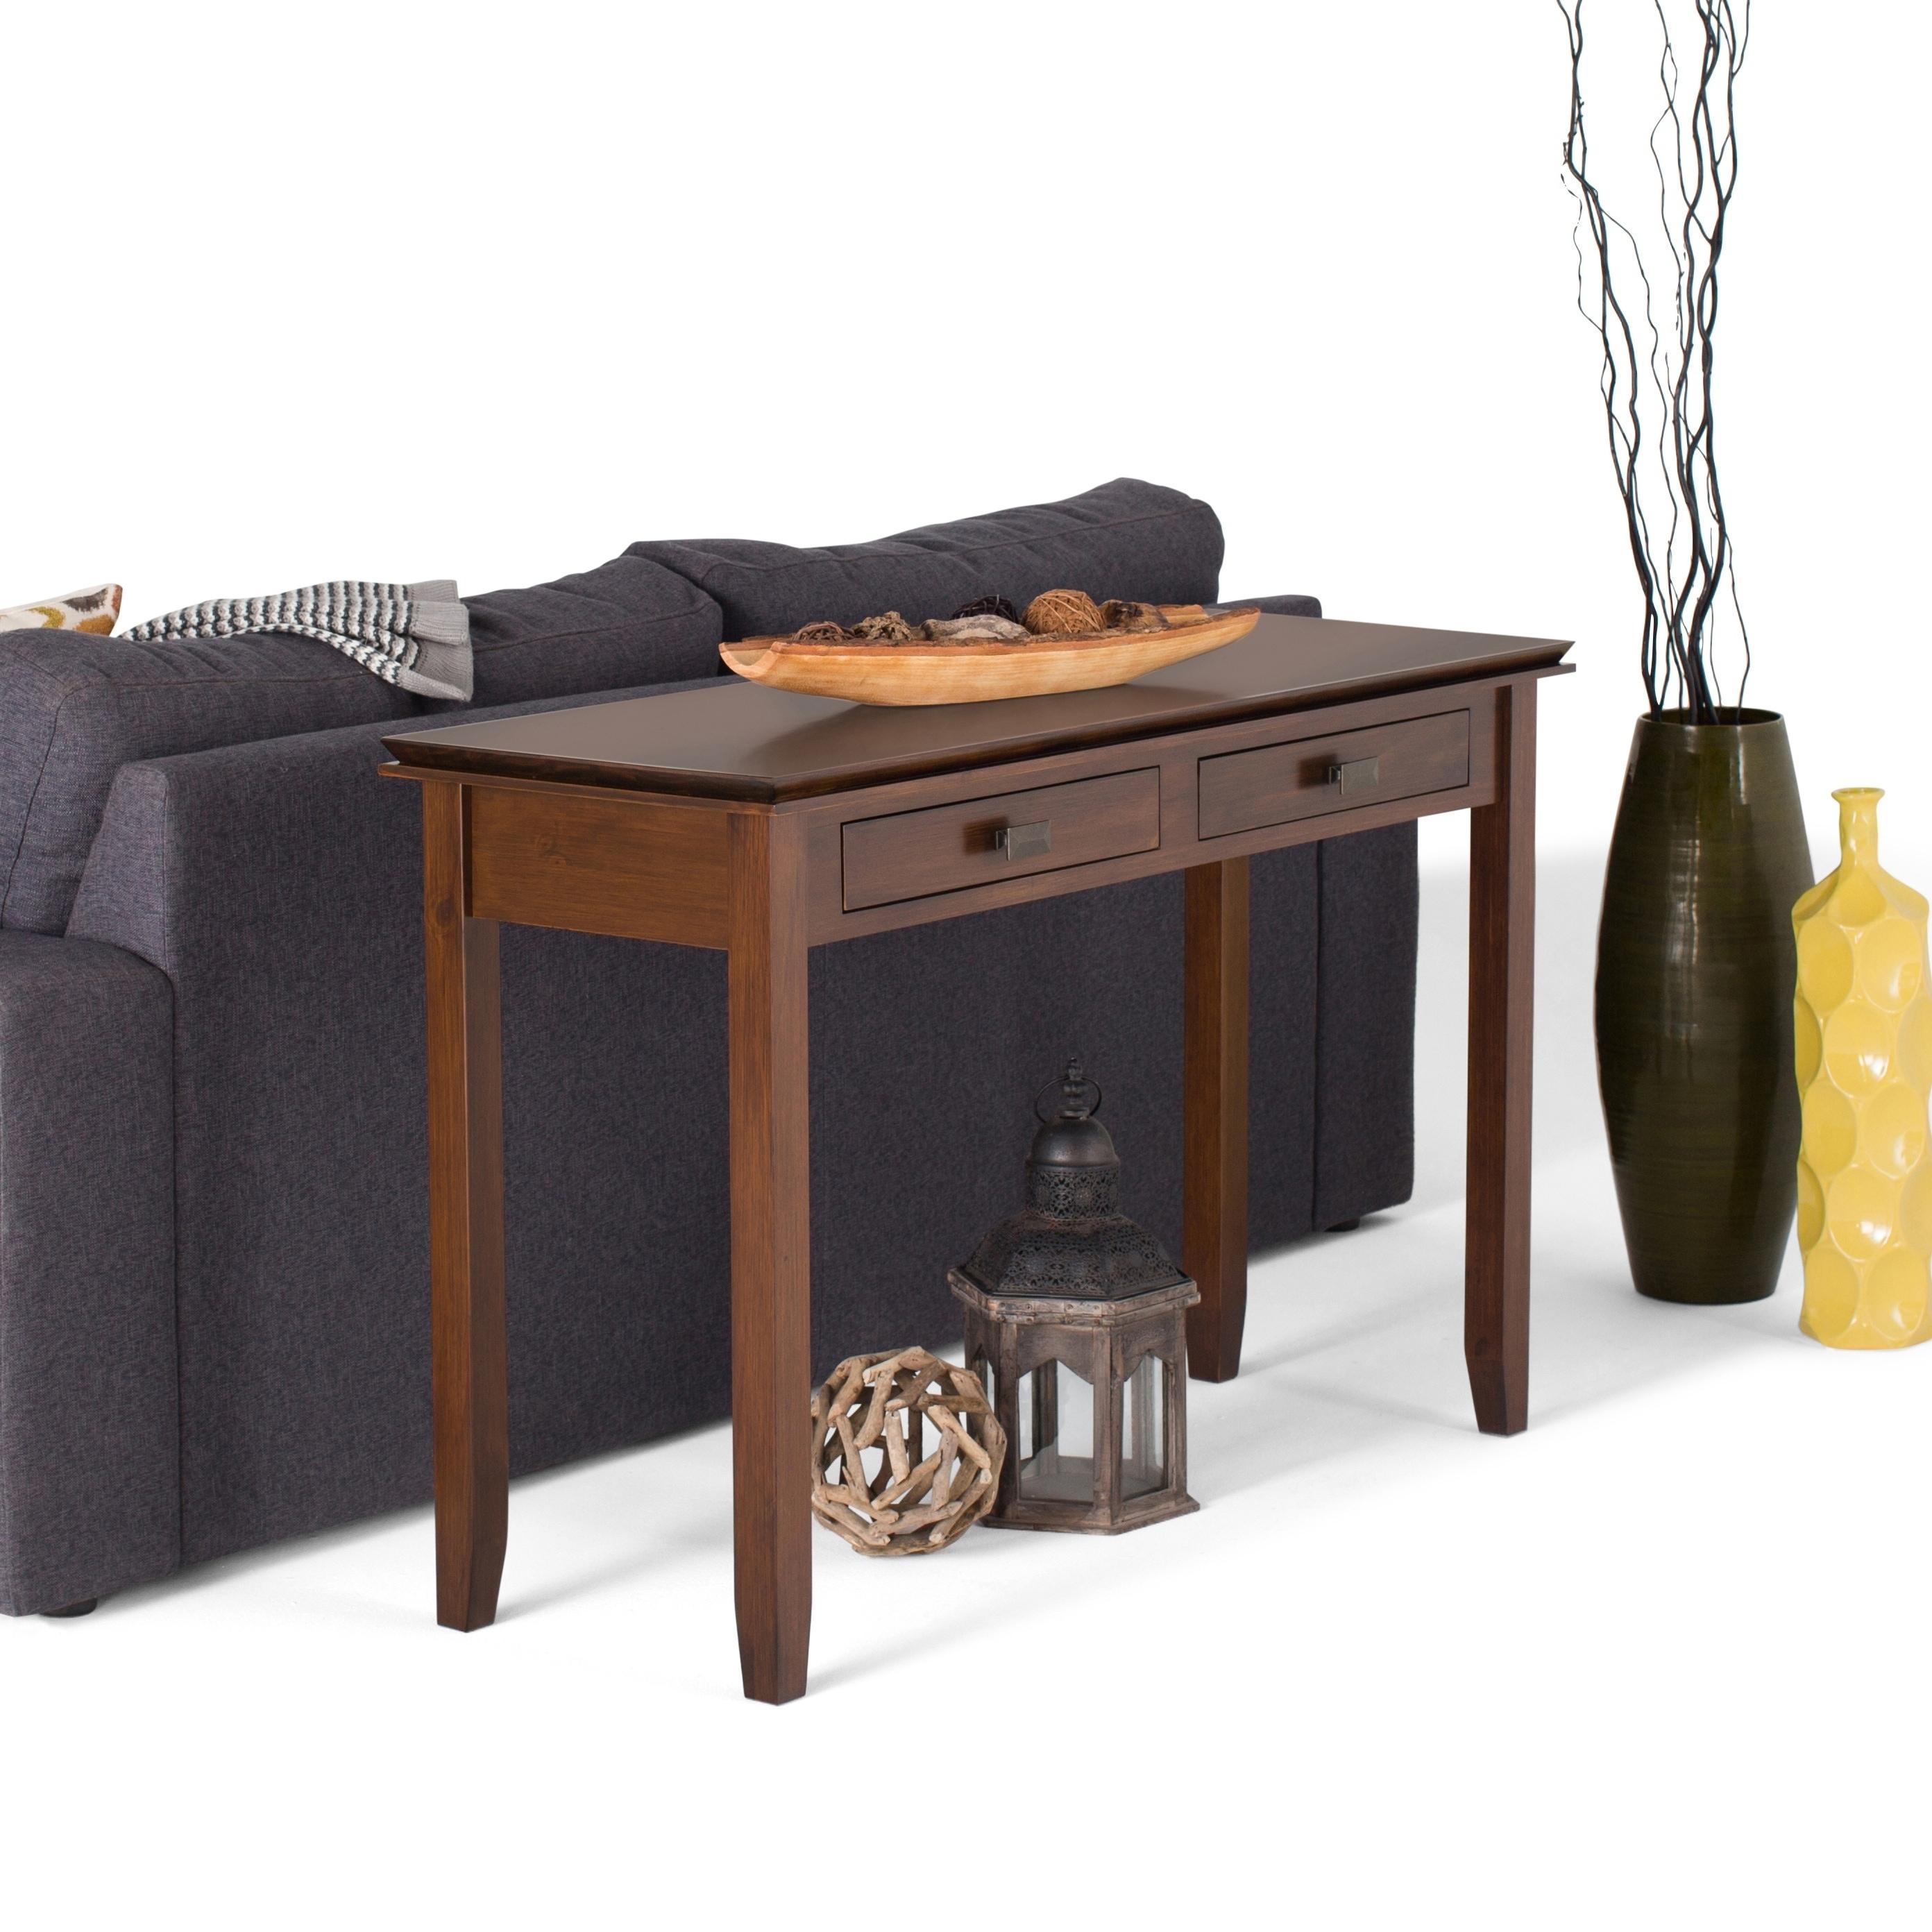 Shop WYNDENHALL Stratford Solid Wood 54 inch Wide Contemporary